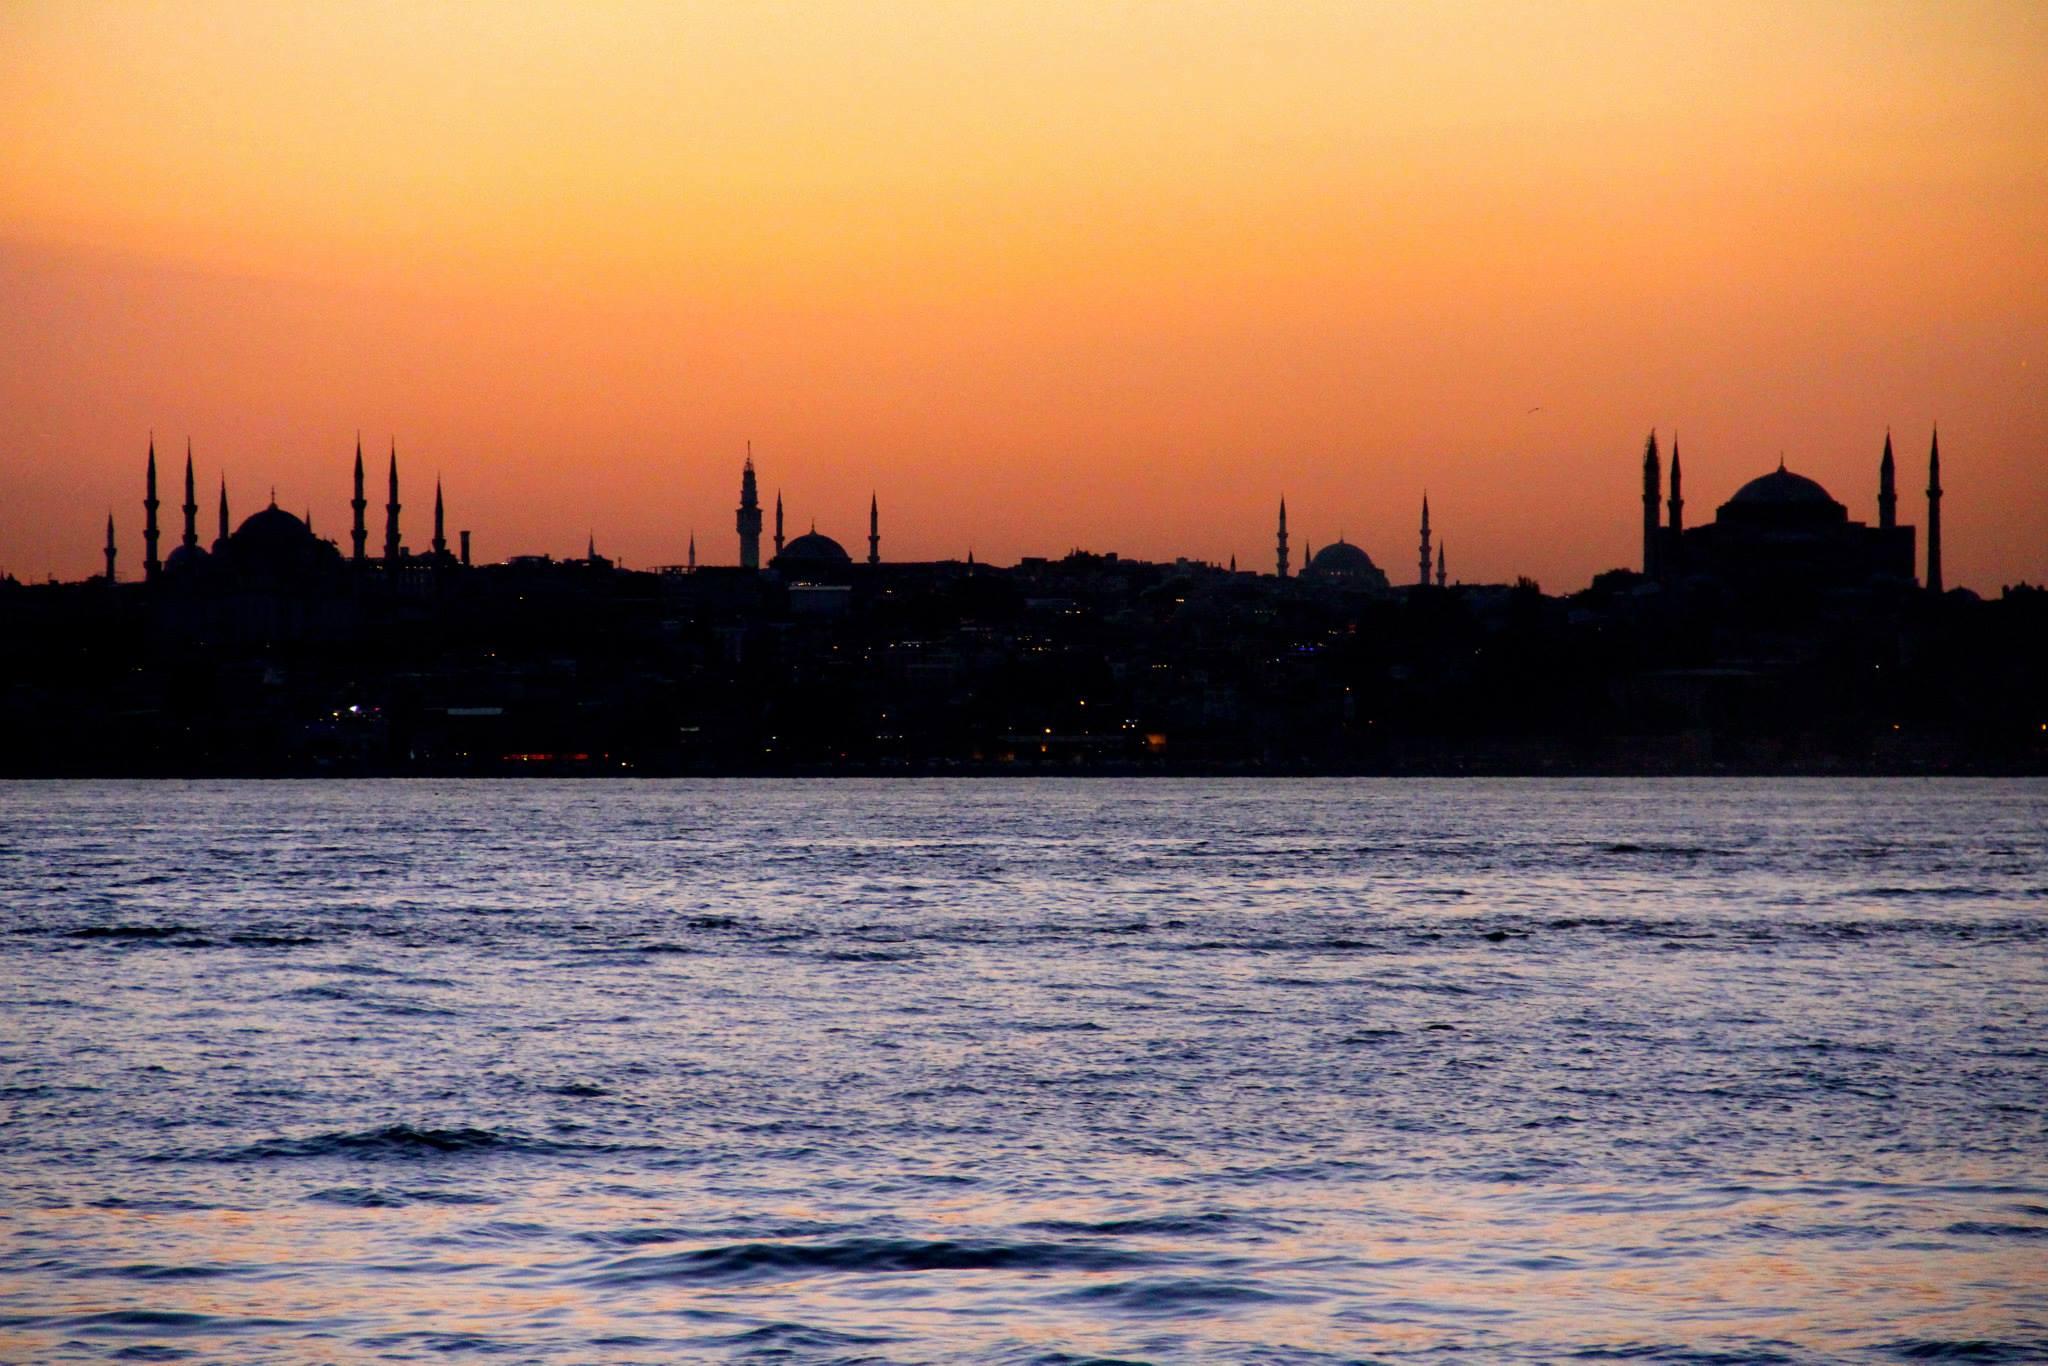 Bosphorus Strait, Istanbul, Turkey